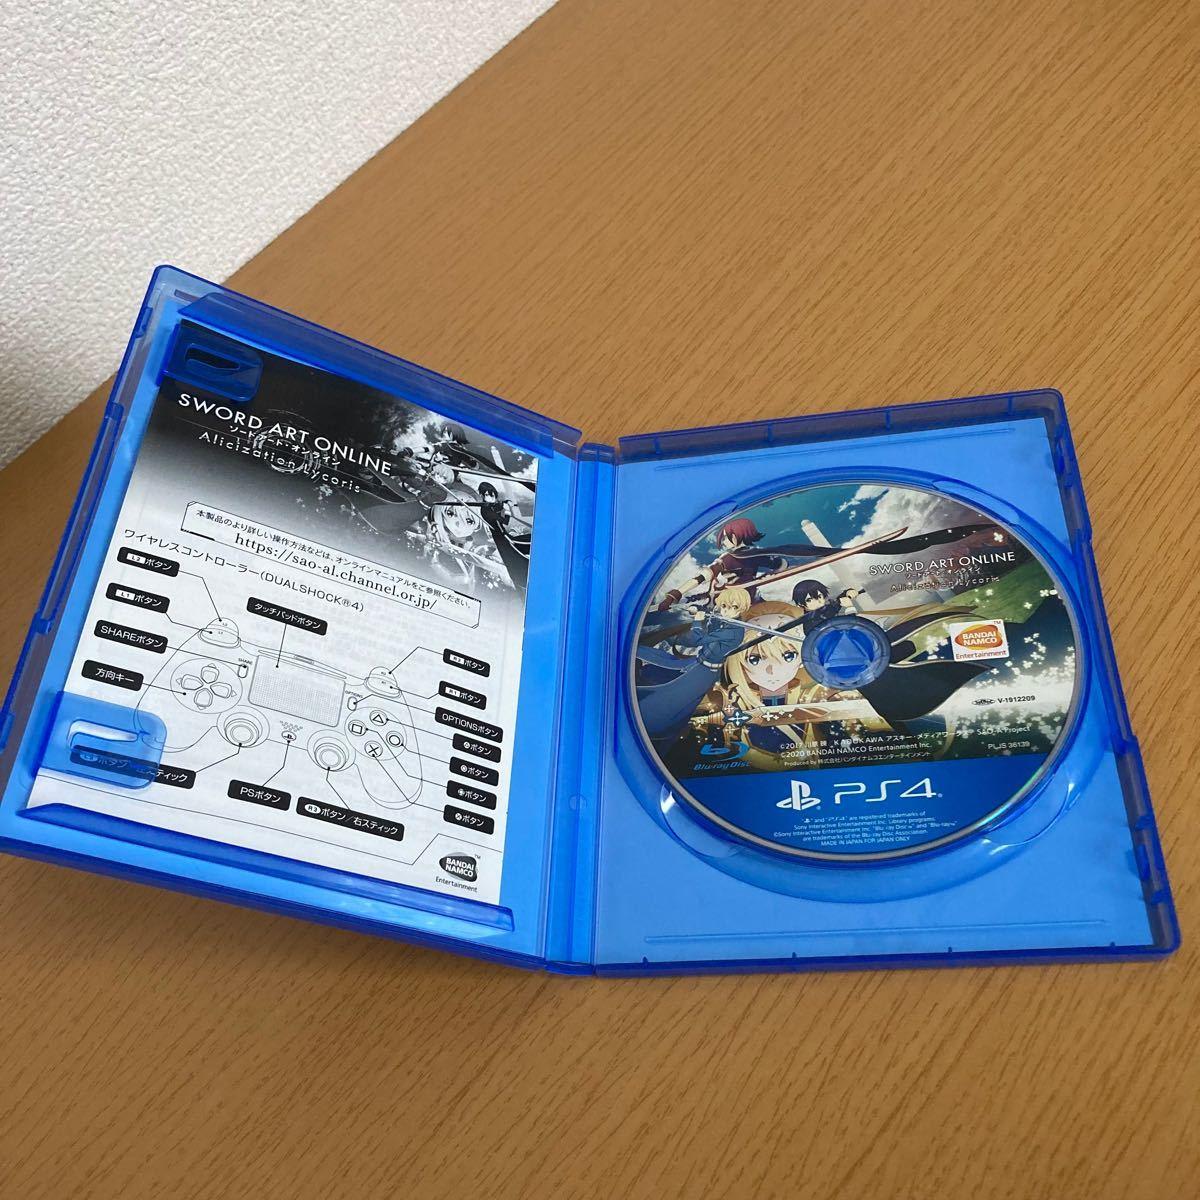 PS4 ソードアート・オンライン アリシゼーションリコリス